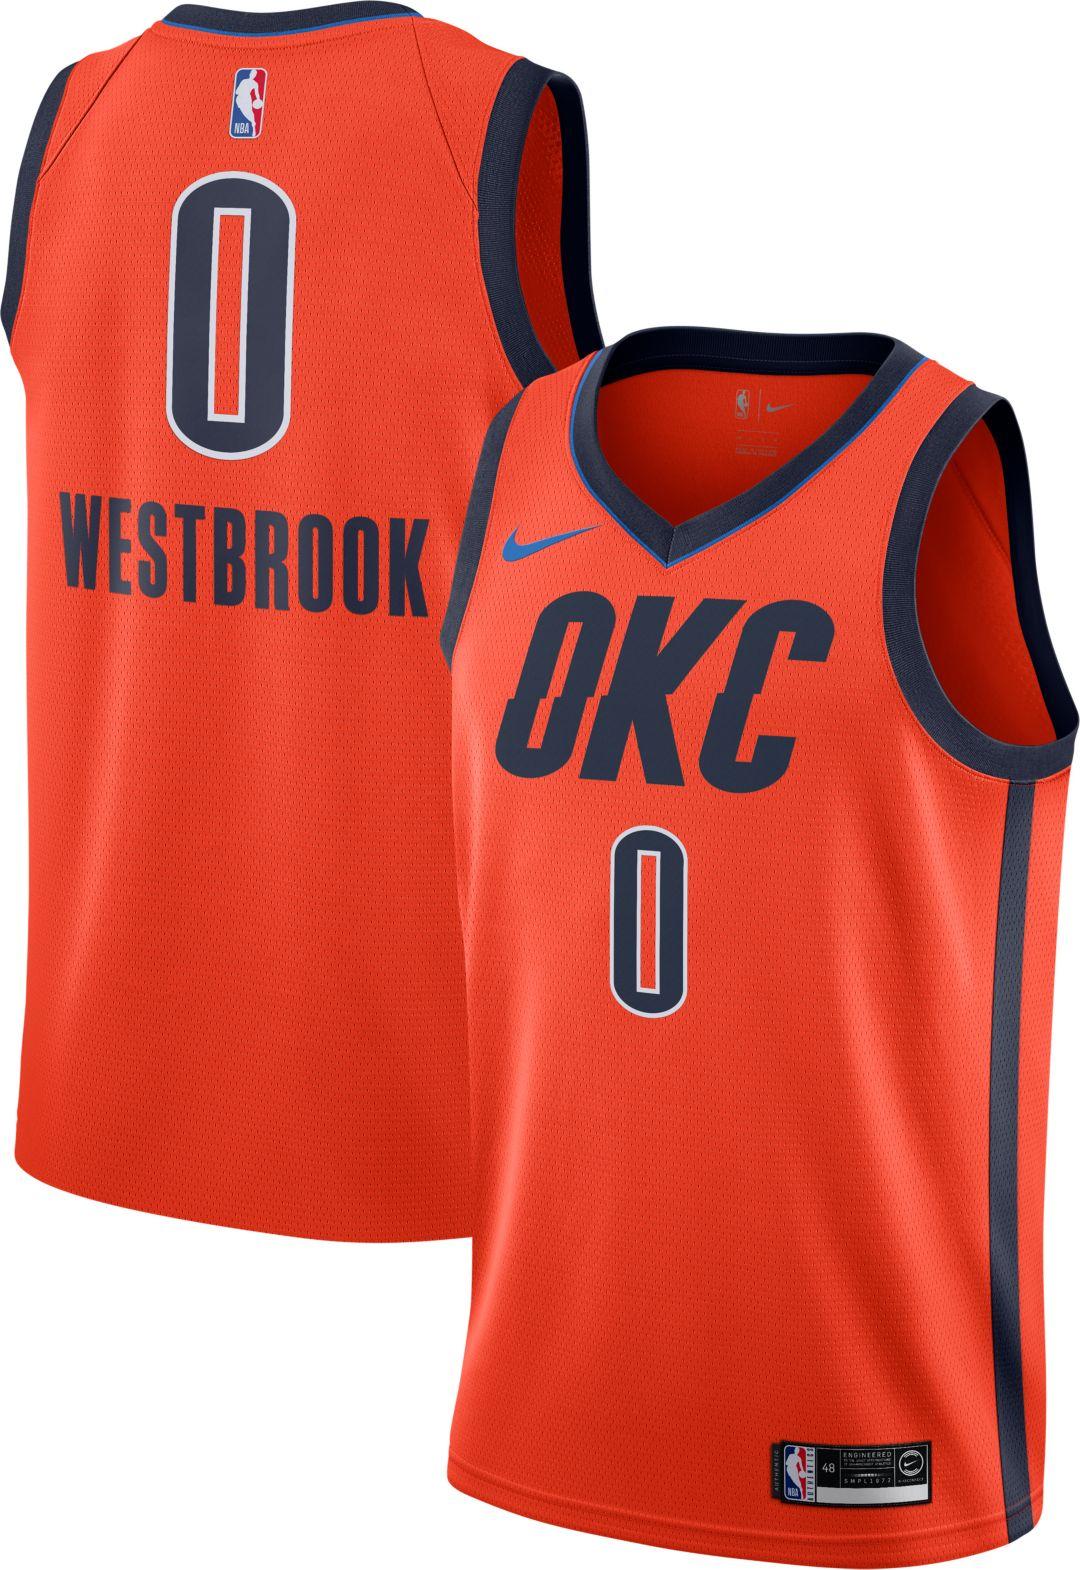 promo code 8b7cc 608b9 Nike Men s Oklahoma City Thunder Russell Westbrook Dri-FIT Earned Edition  Swingman Jersey. noImageFound. Previous